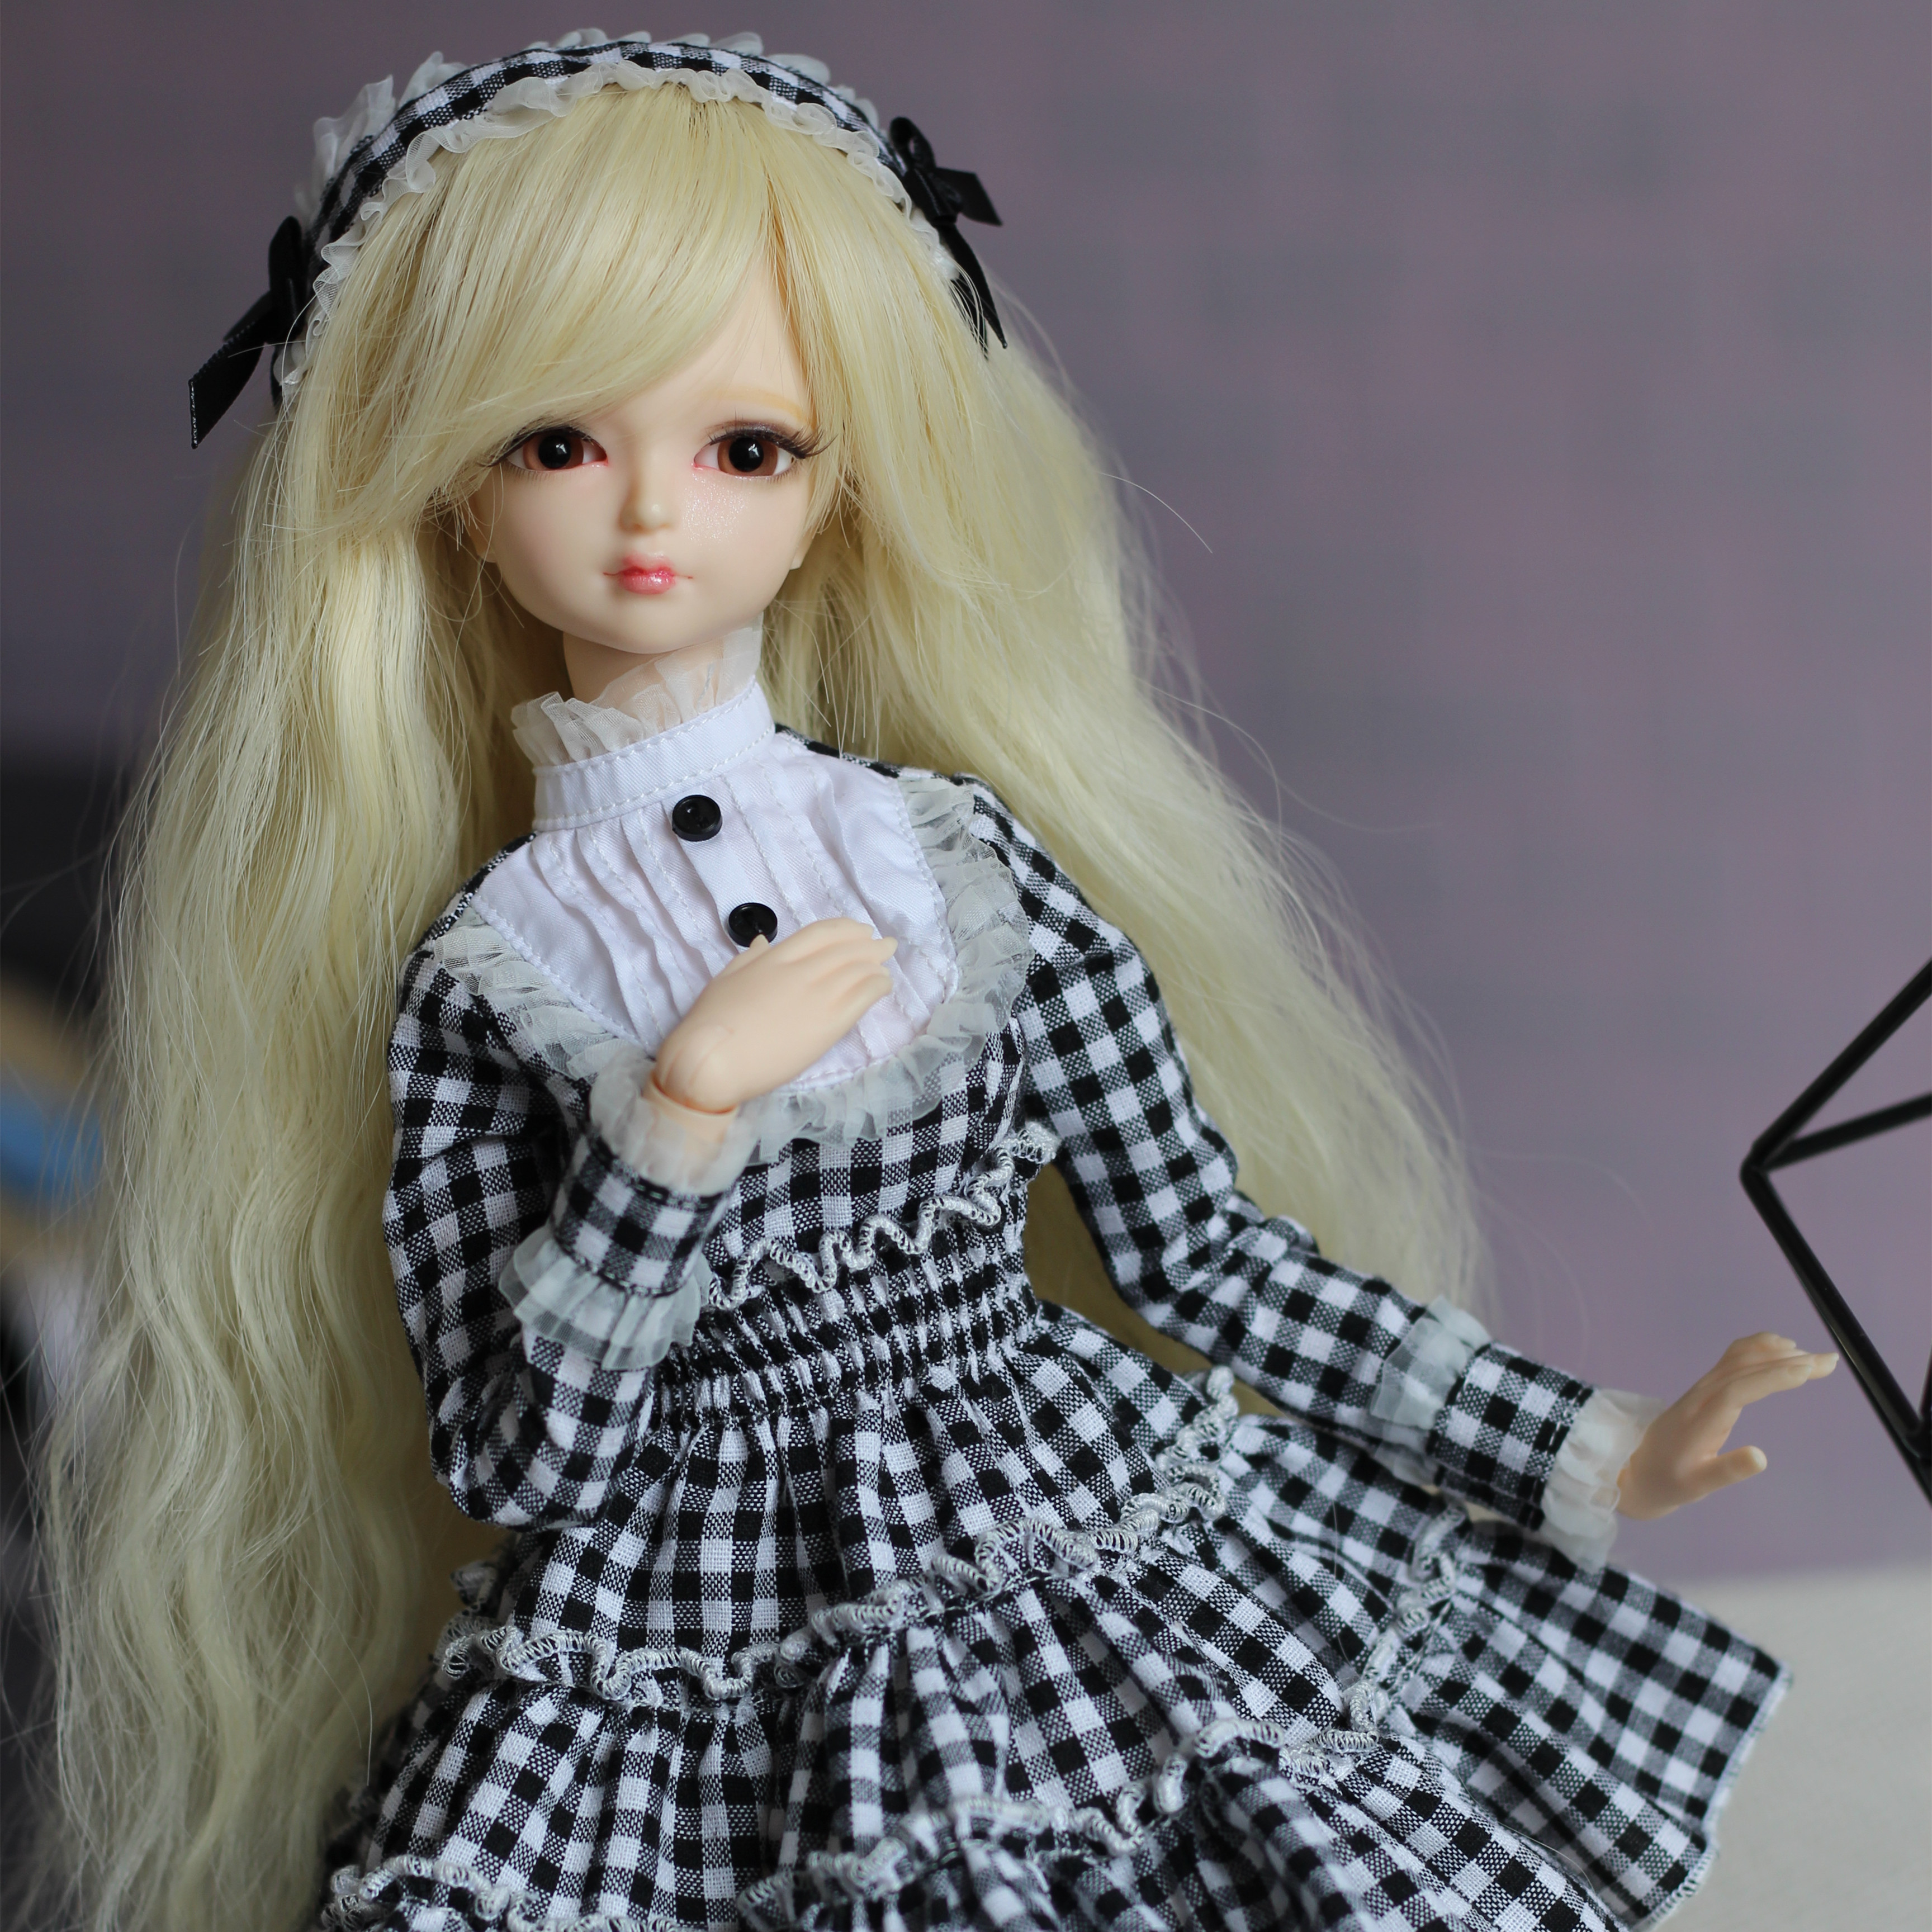 Dbs 1/4 bjd 45cm corpo conjunto boneca roupas terno vestido, apenas roupas sem boneca nenhum corpo